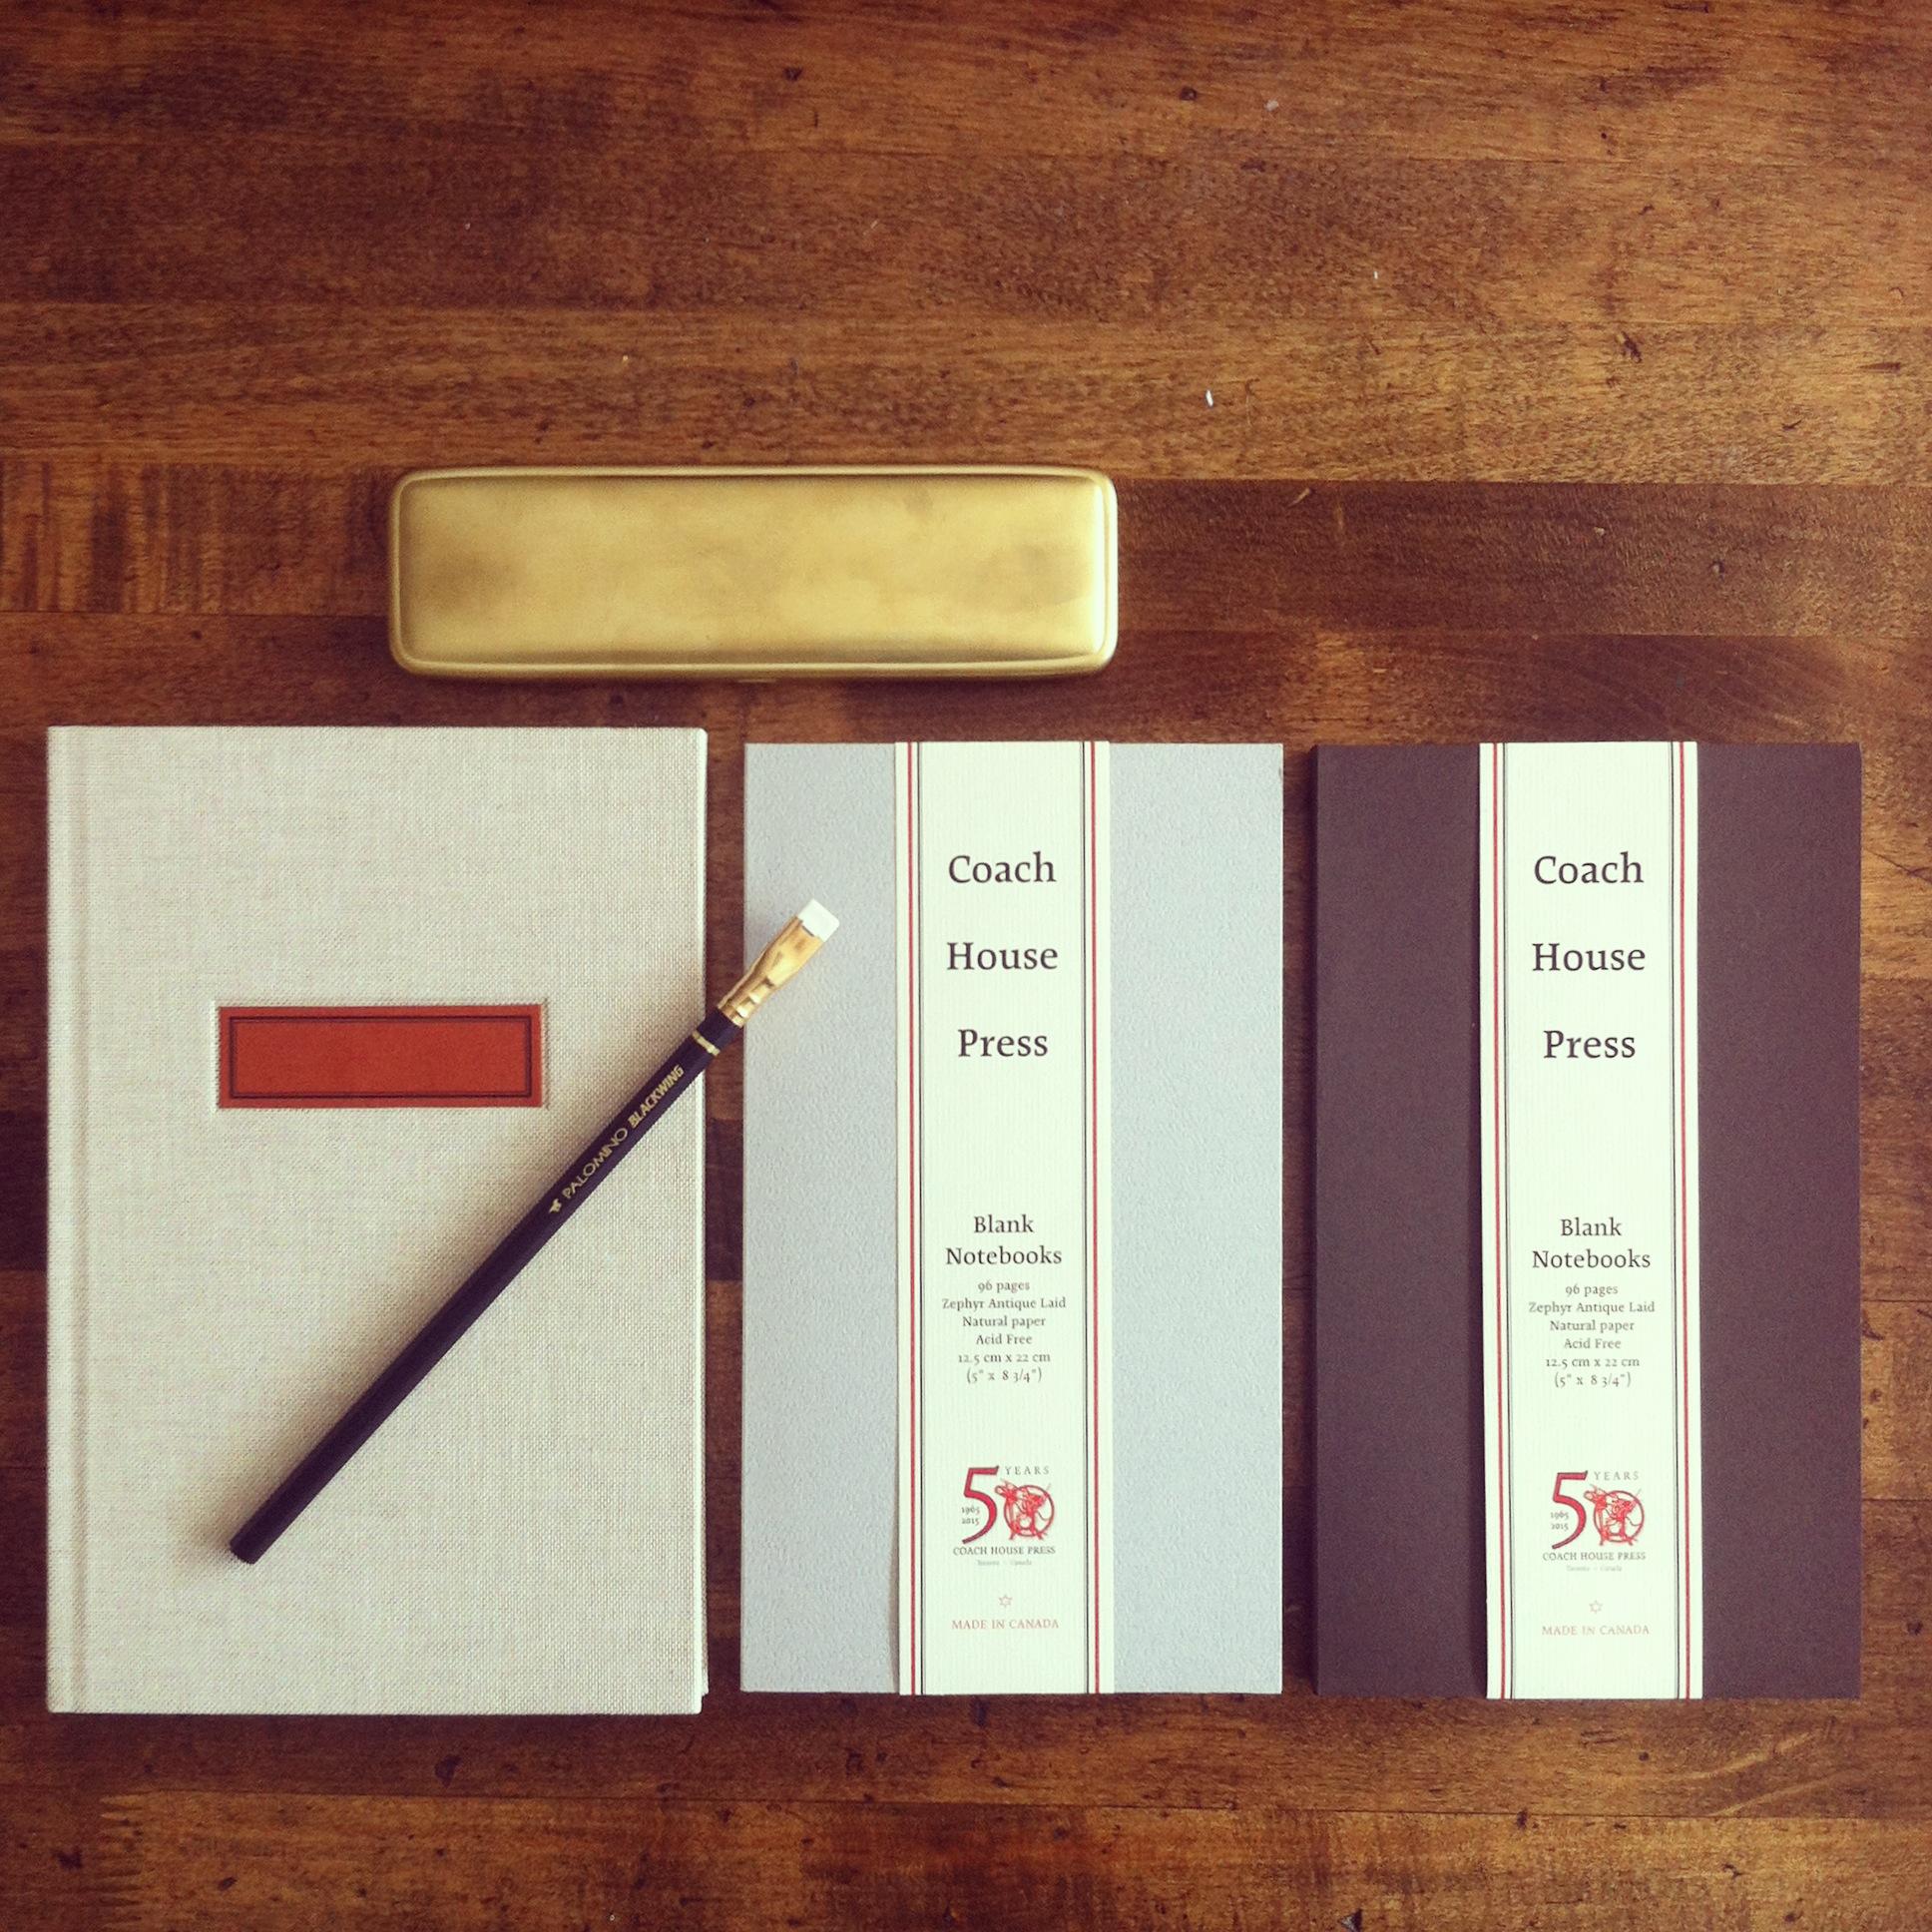 Coach House Press Soft Cover and Hardbound Notebooks